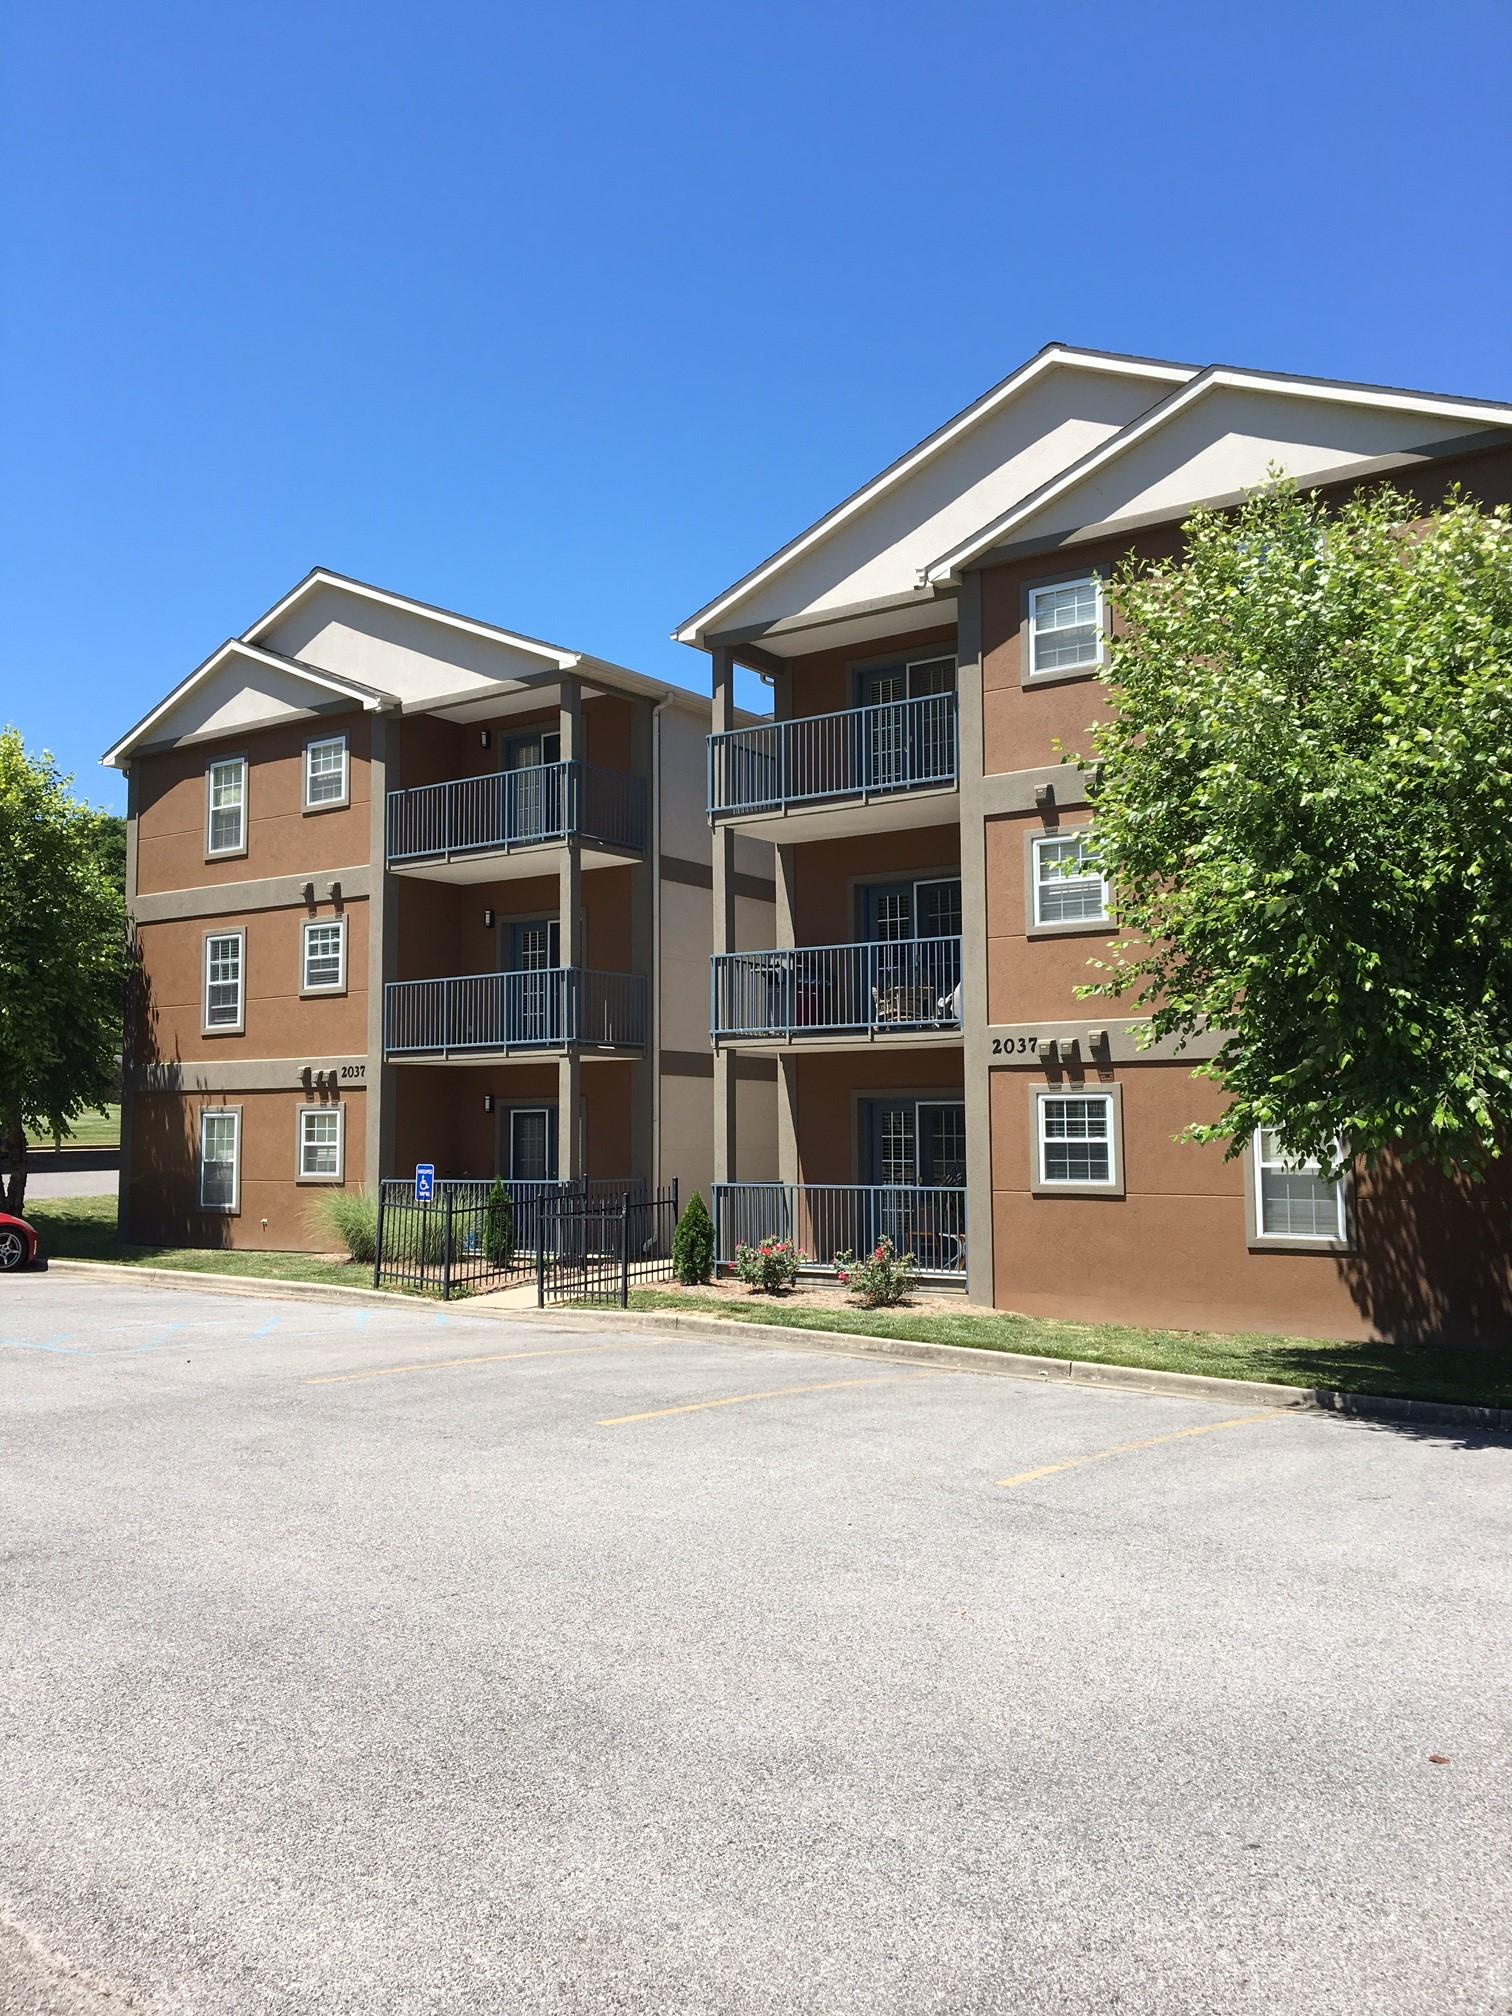 Pear Tree Court Apartments - Cape Girardeau, Missouri